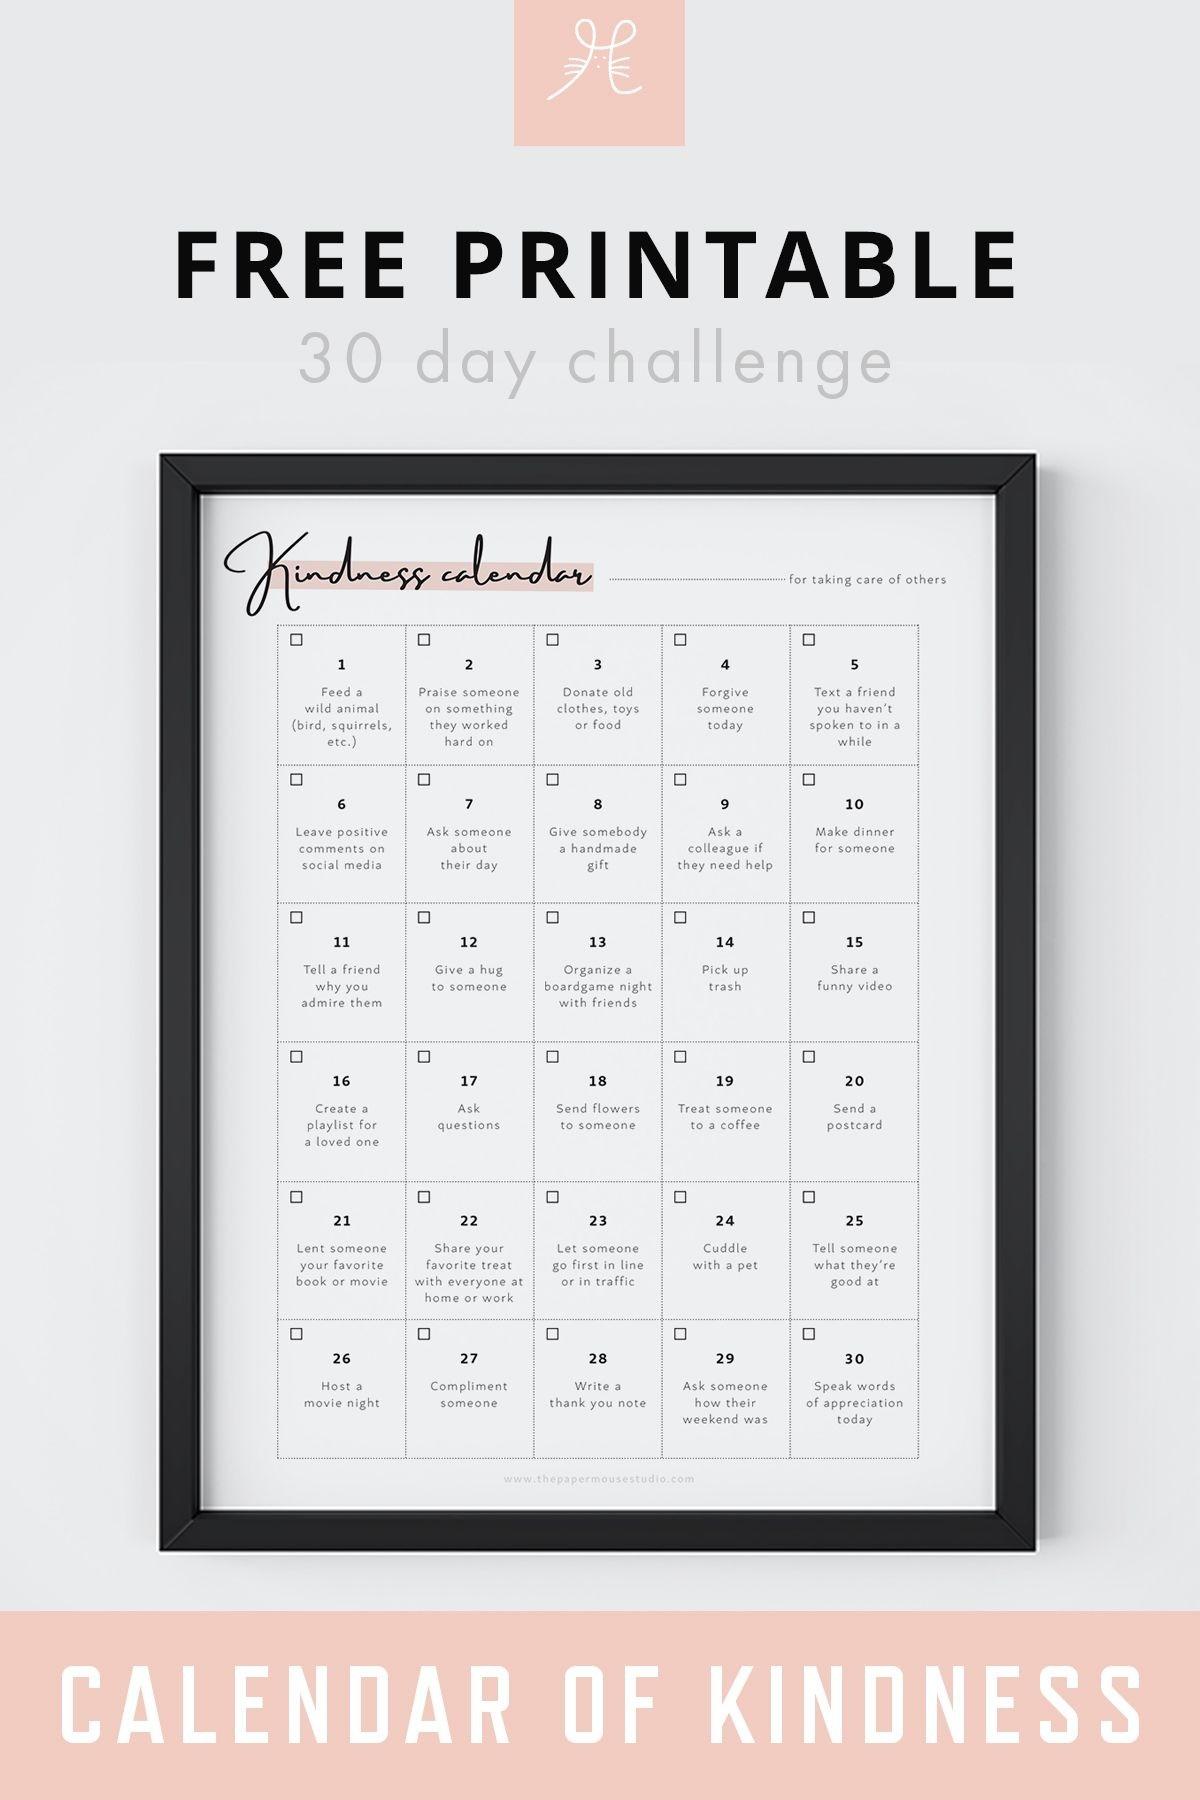 Free Printable 30 Day Challenge Calendar Of Kindness  Printable 30 Day Challenge Blank Calendar